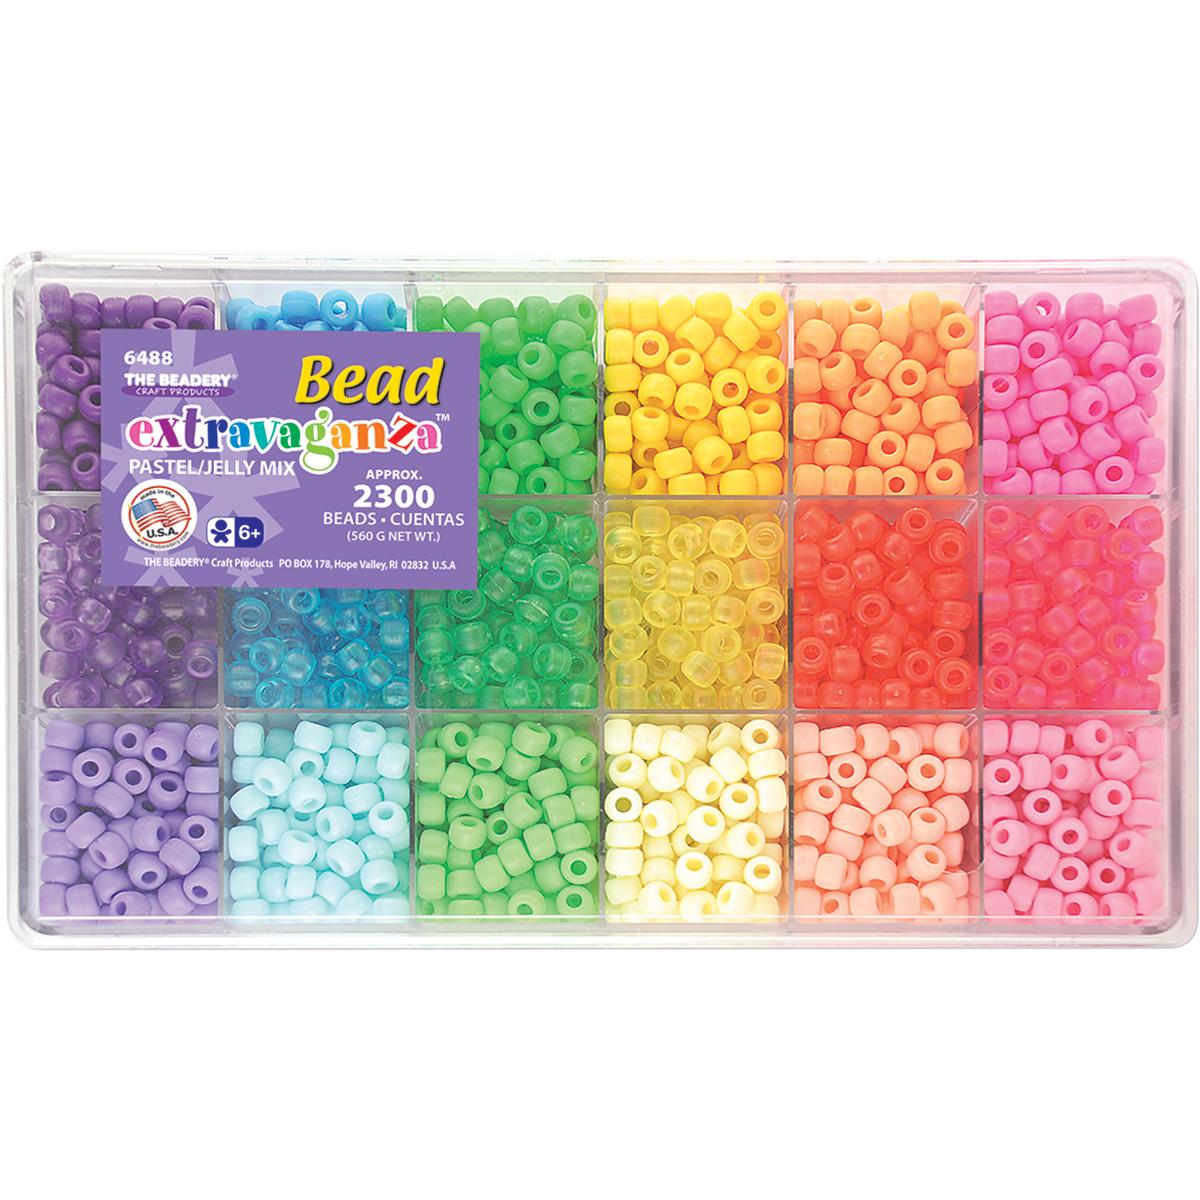 Bead Extravaganza Bead Box Kit 19.75Oz - image 1 of 1